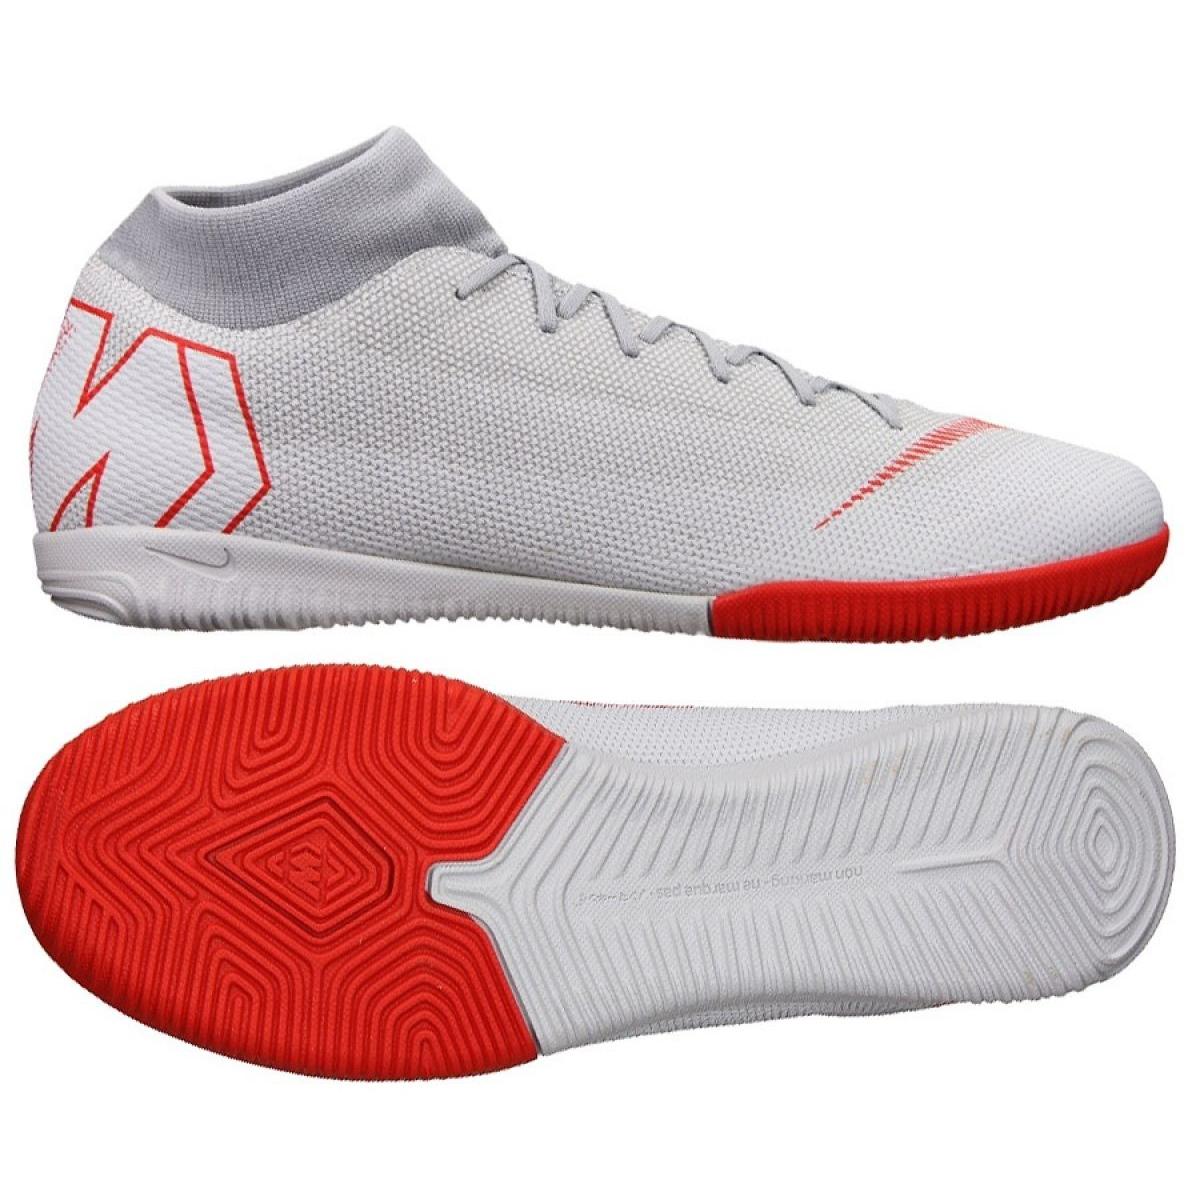 Chaussures de football Nike Merurial Superflyx 6 Academy Ic M AH7369 060